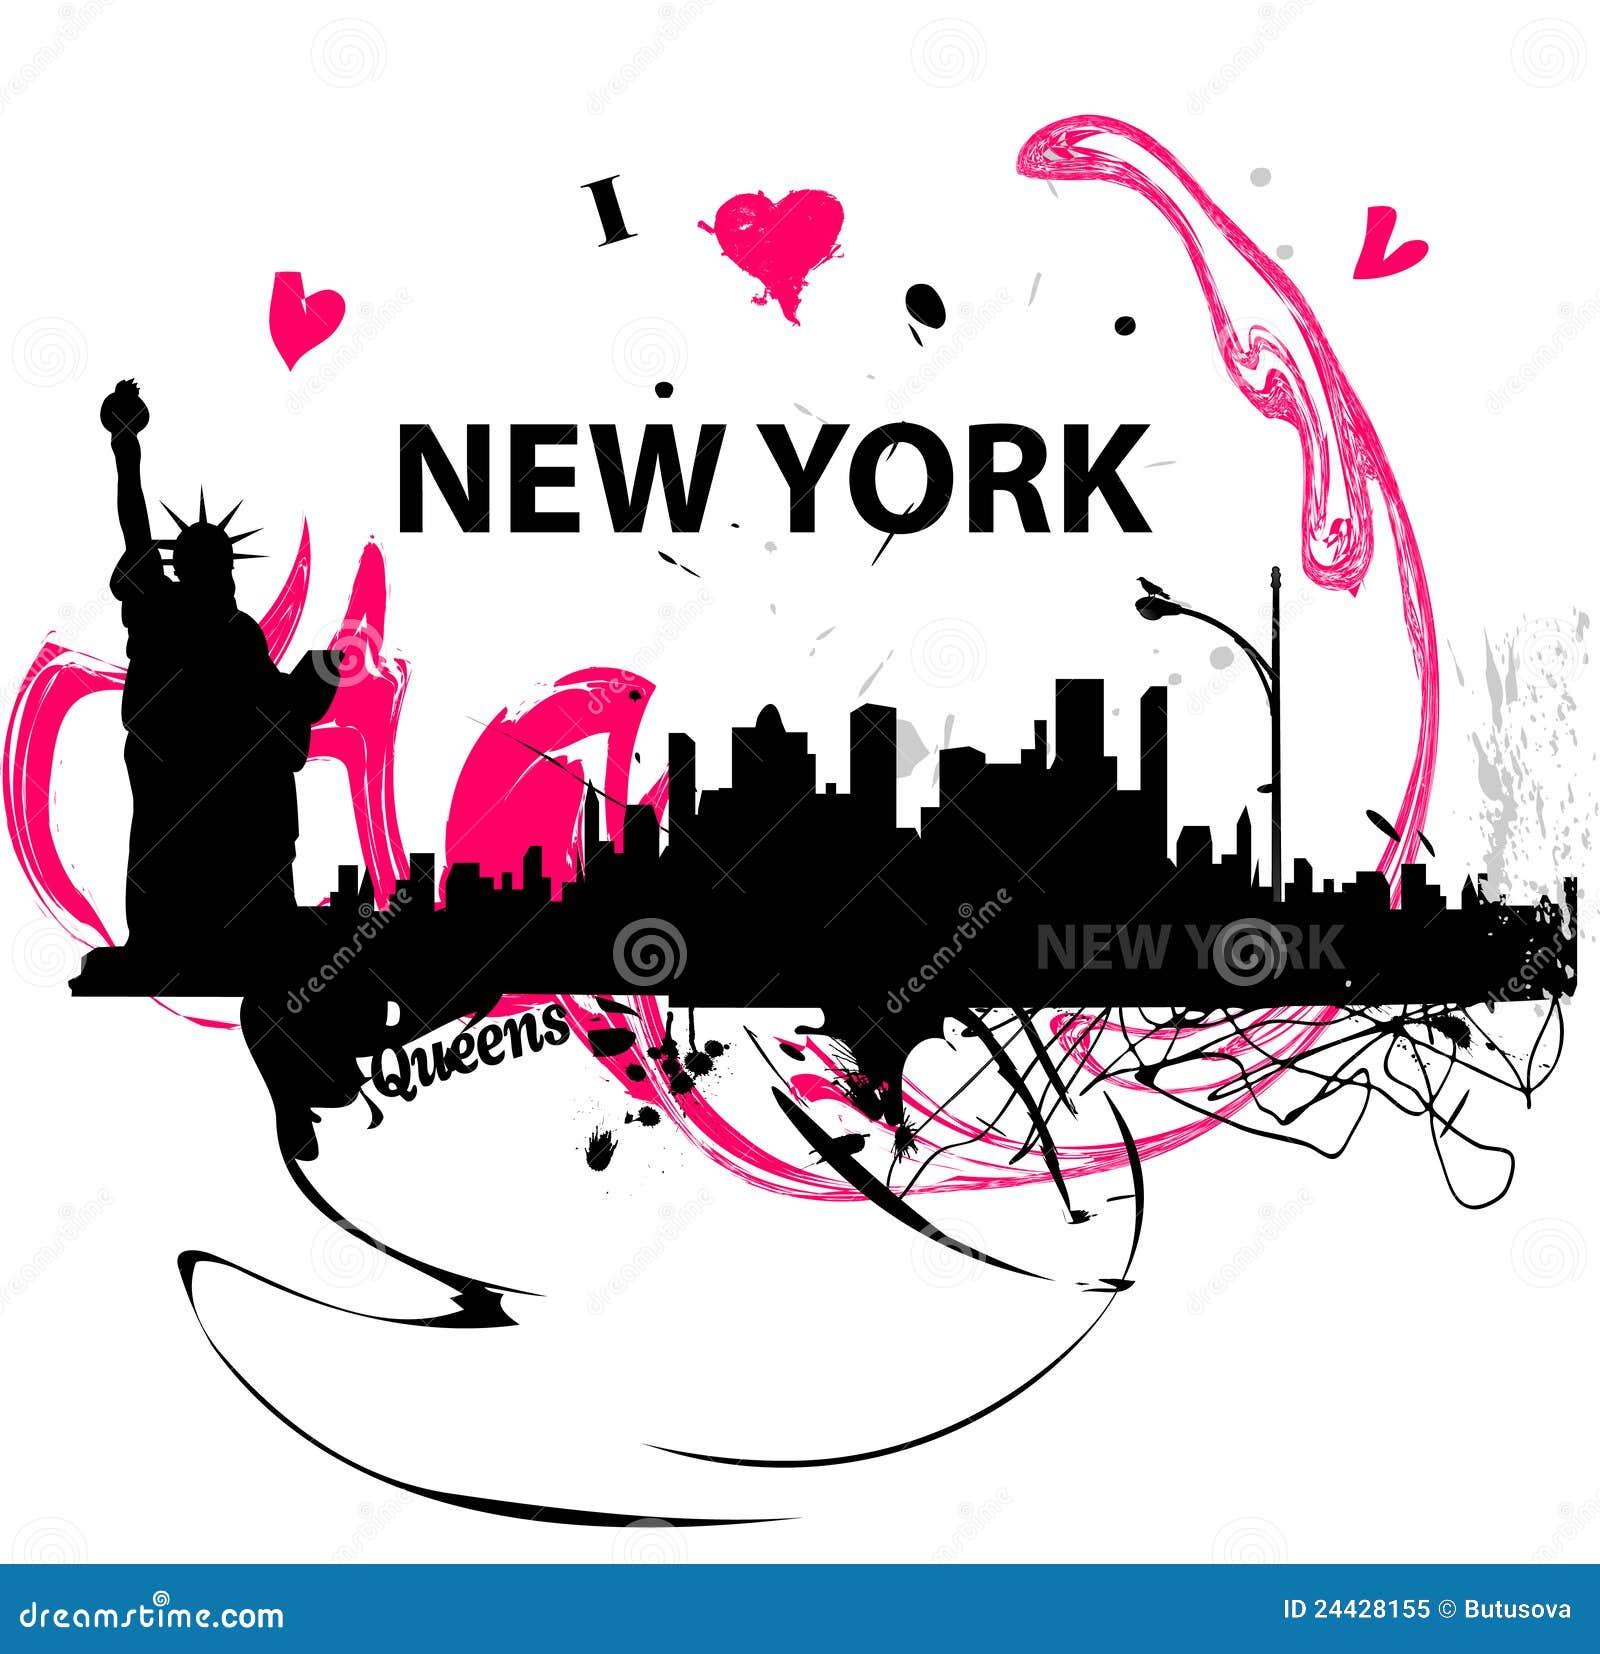 i love new york poster stock image. image of illustration - 24428155